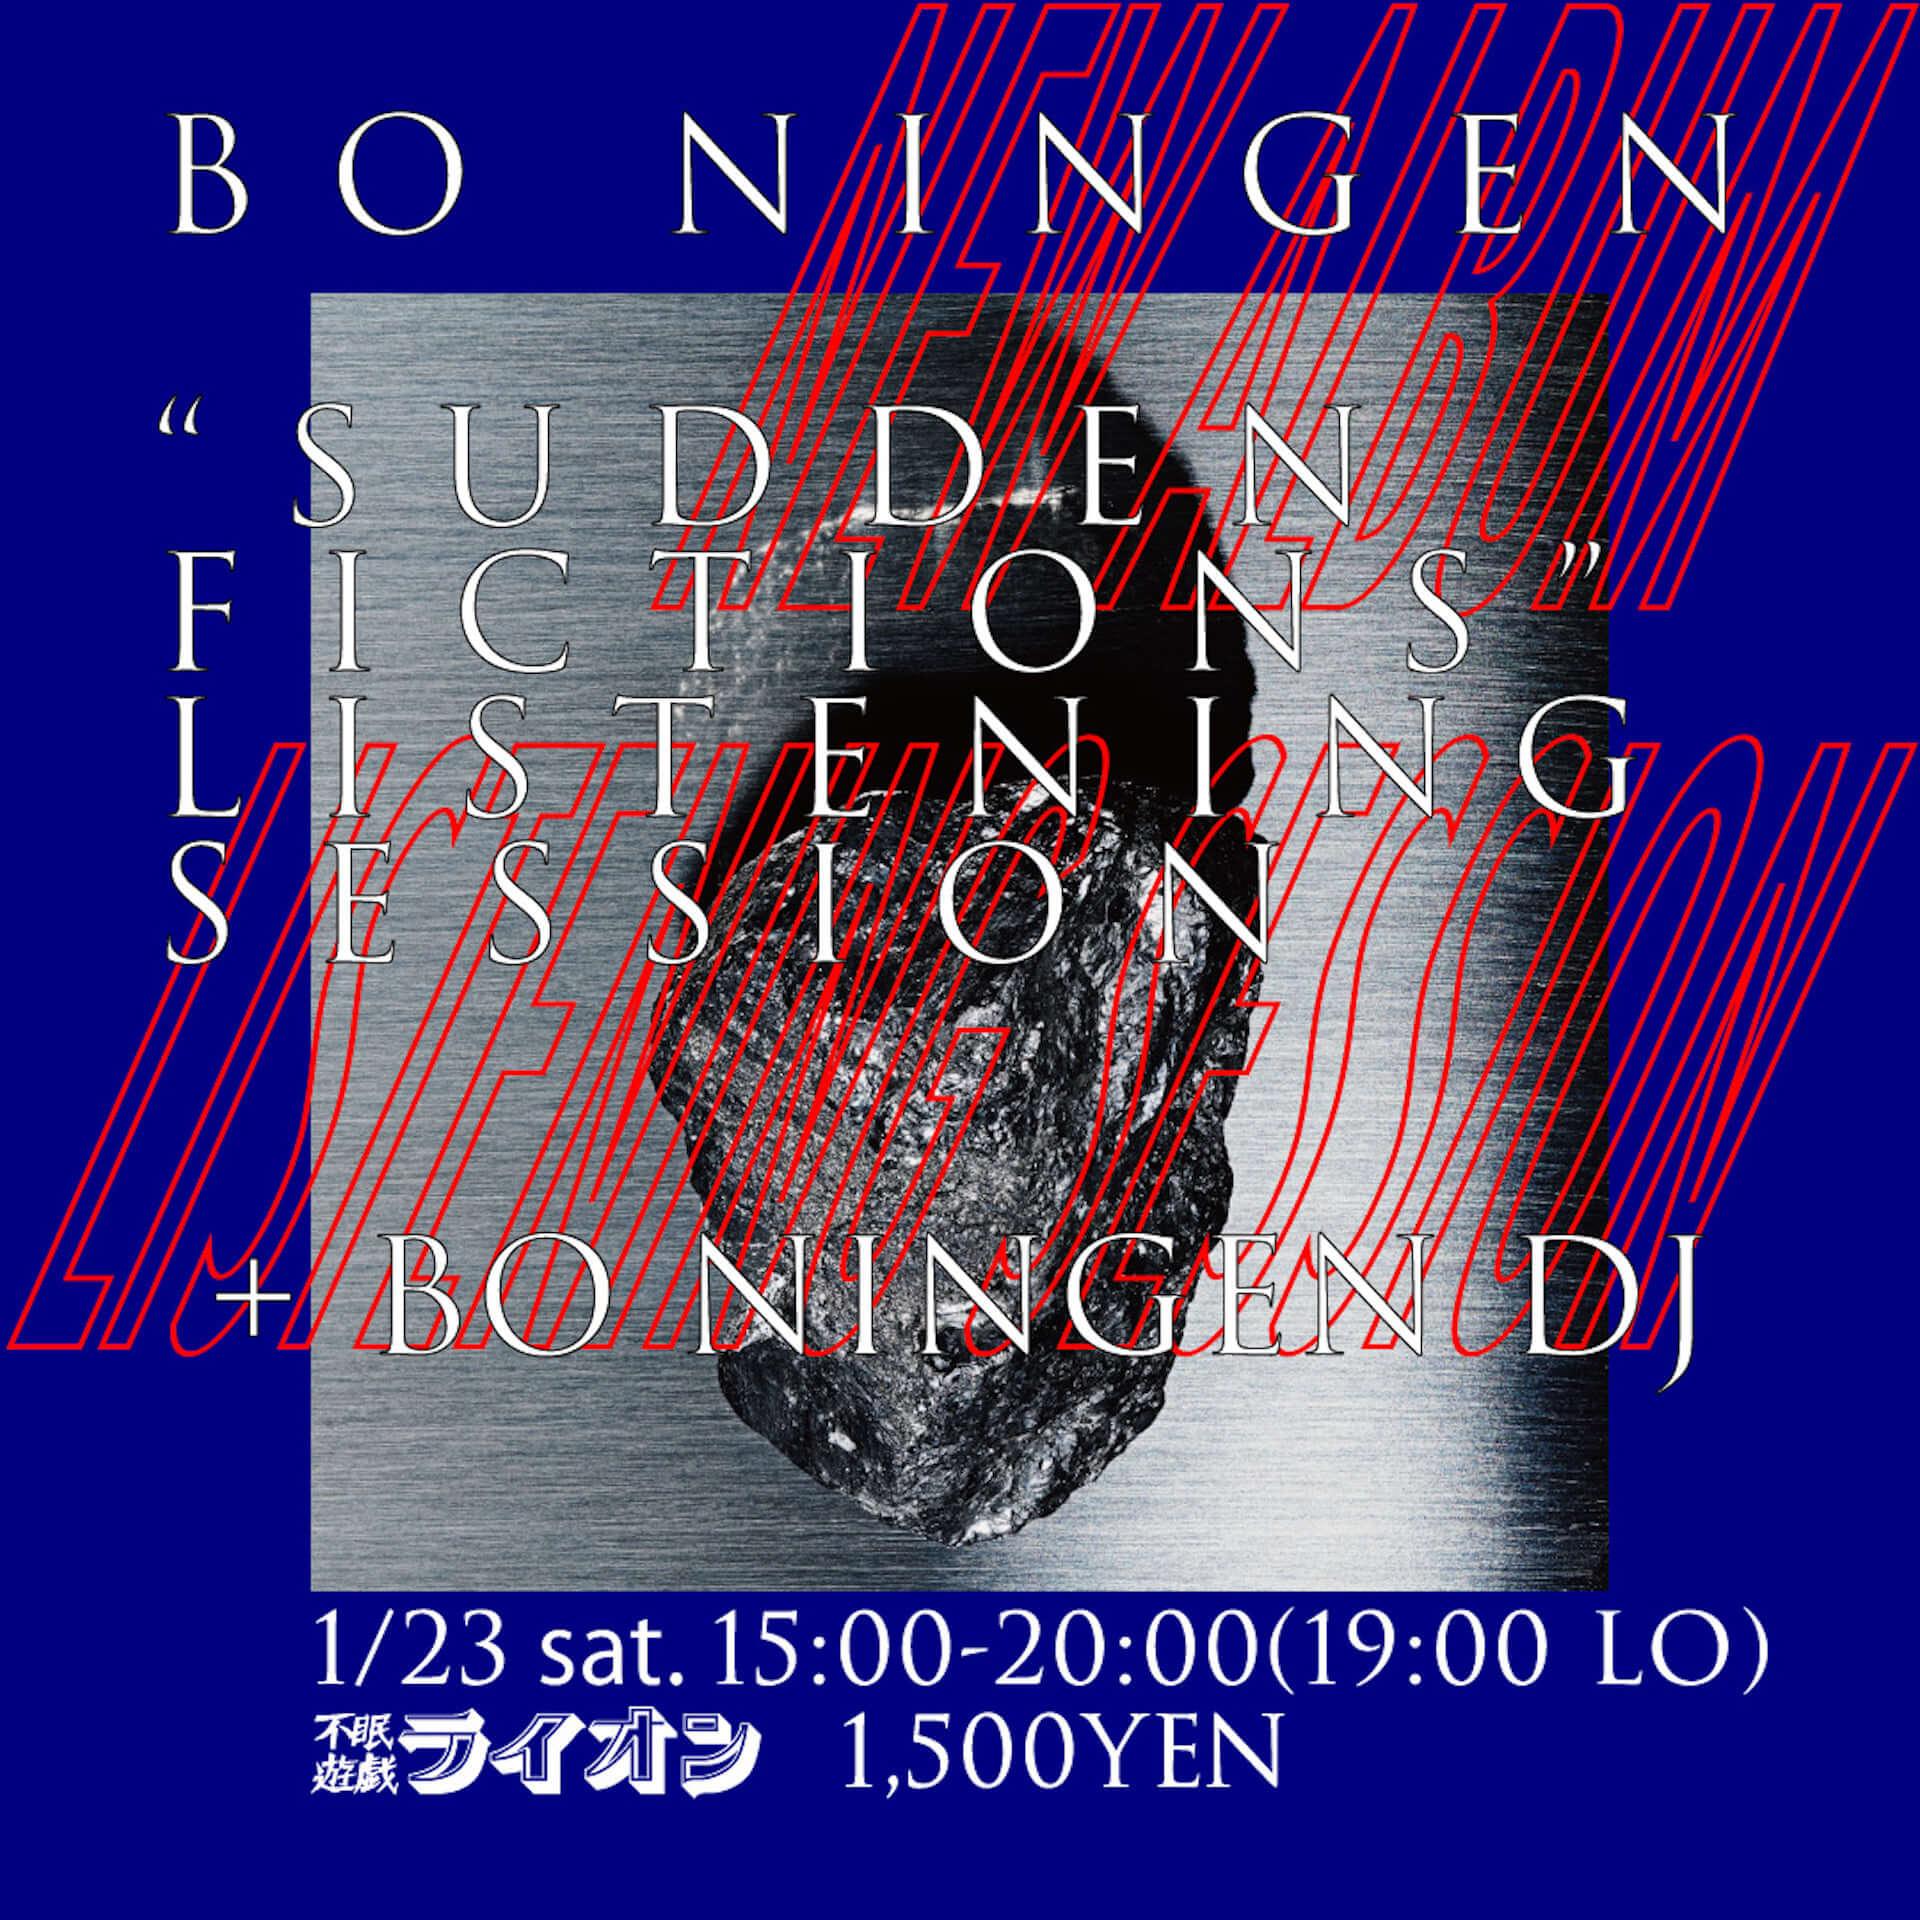 BO NINGENが新アルバム『Sudden Fictions』の国内盤を発売!原宿・不眠遊戯ライオンにてリスニングセッションが実施決定 music210120_boningen_2-1920x1920